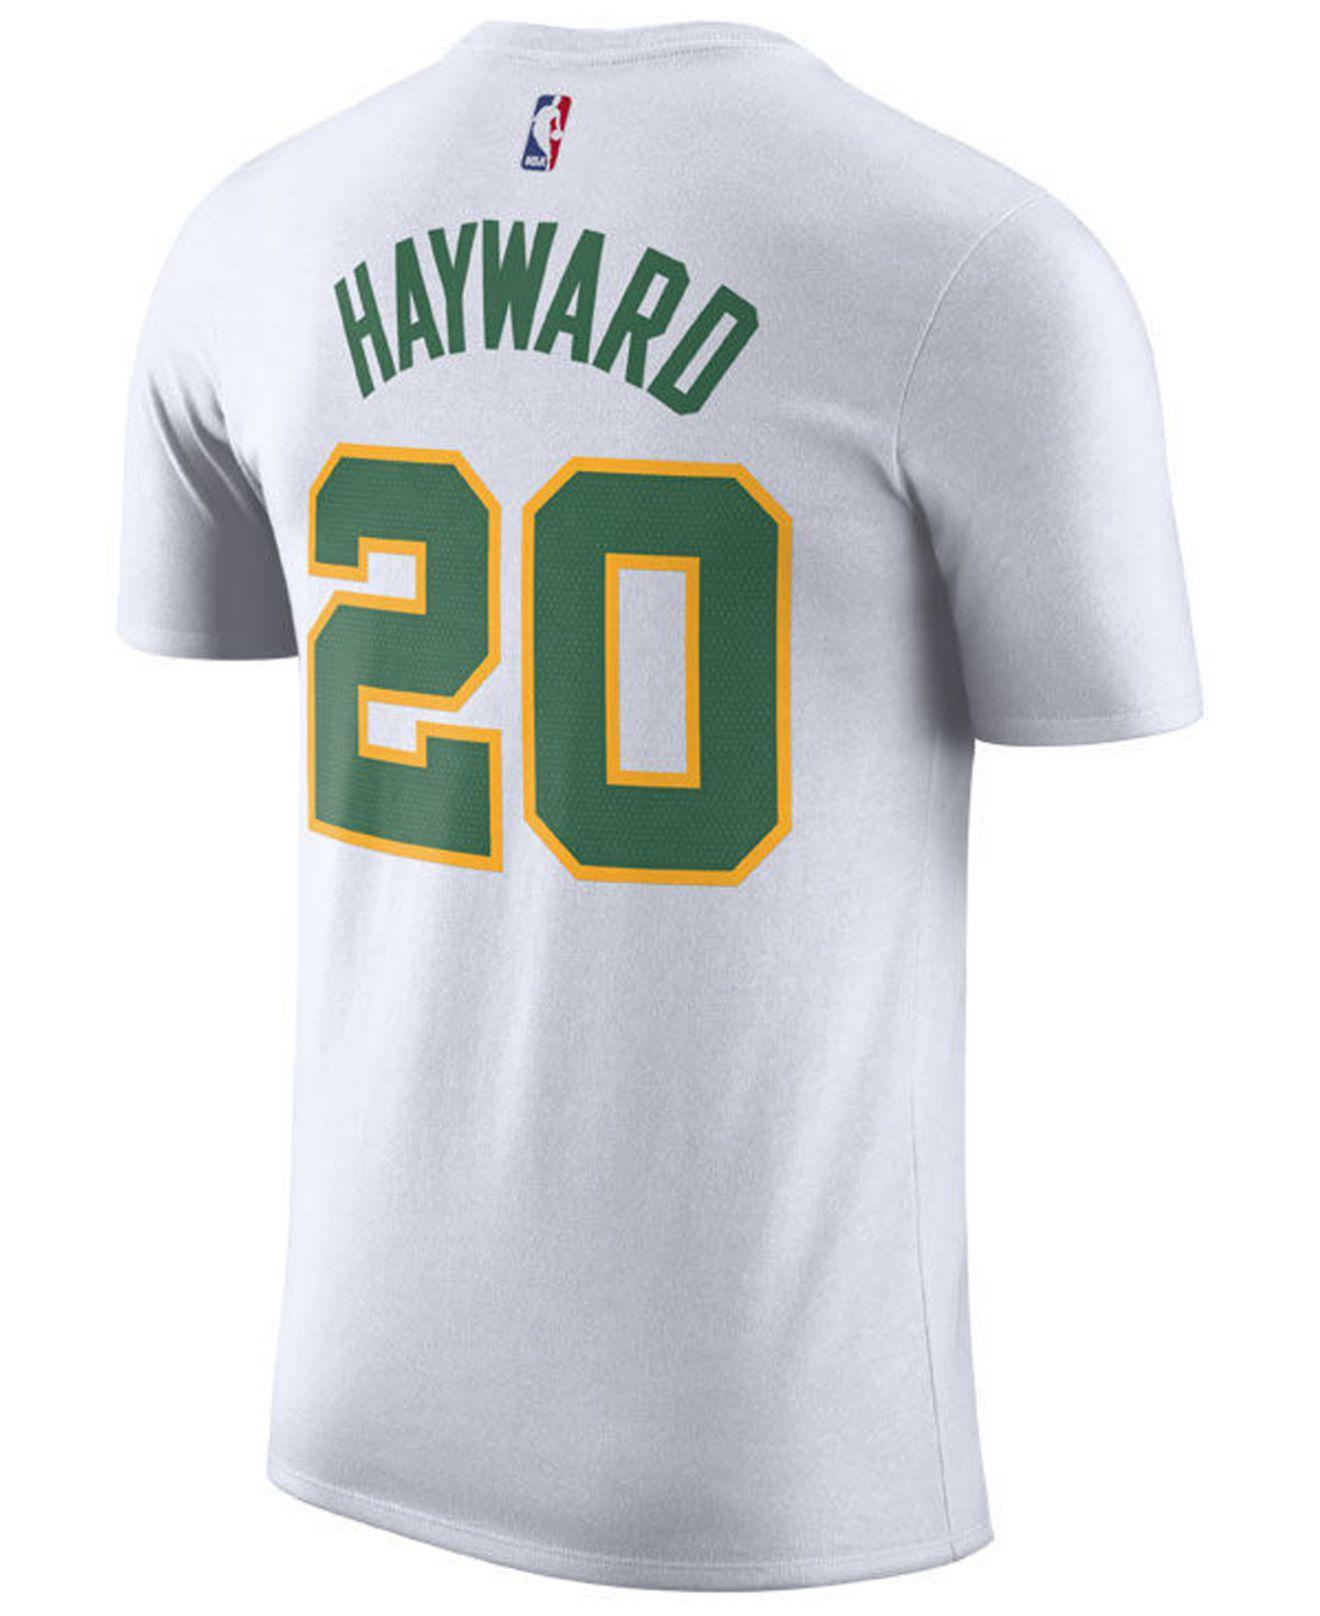 18bfbf175 Lyst - Nike Gordon Hayward Boston Celtics City Player T-shirt 2018 in White  for Men